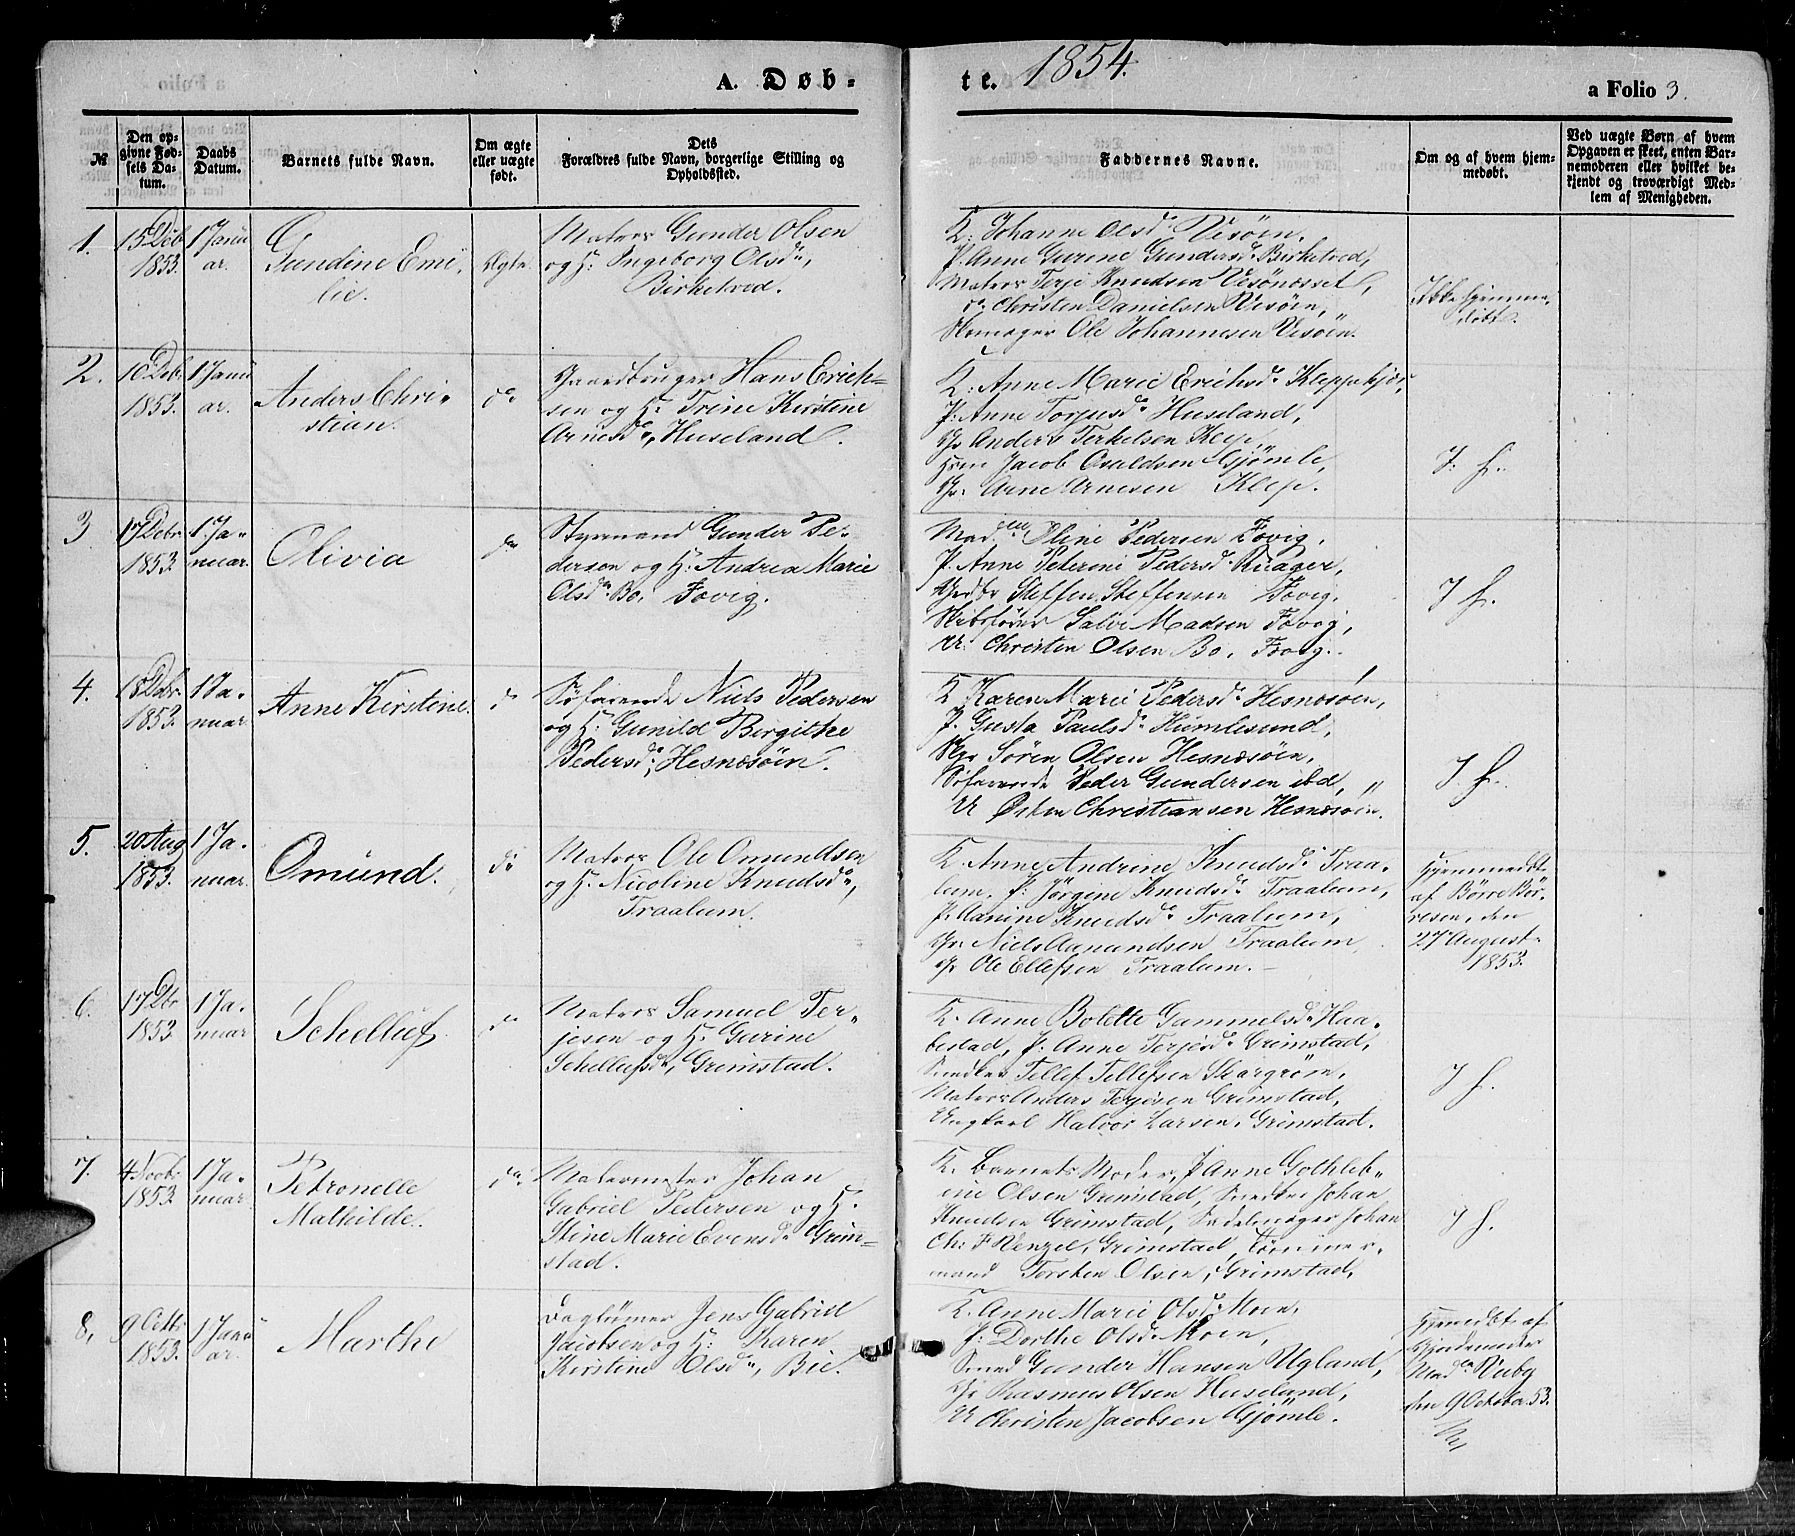 SAK, Fjære sokneprestkontor, F/Fb/L0008: Klokkerbok nr. B 8, 1854-1867, s. 3